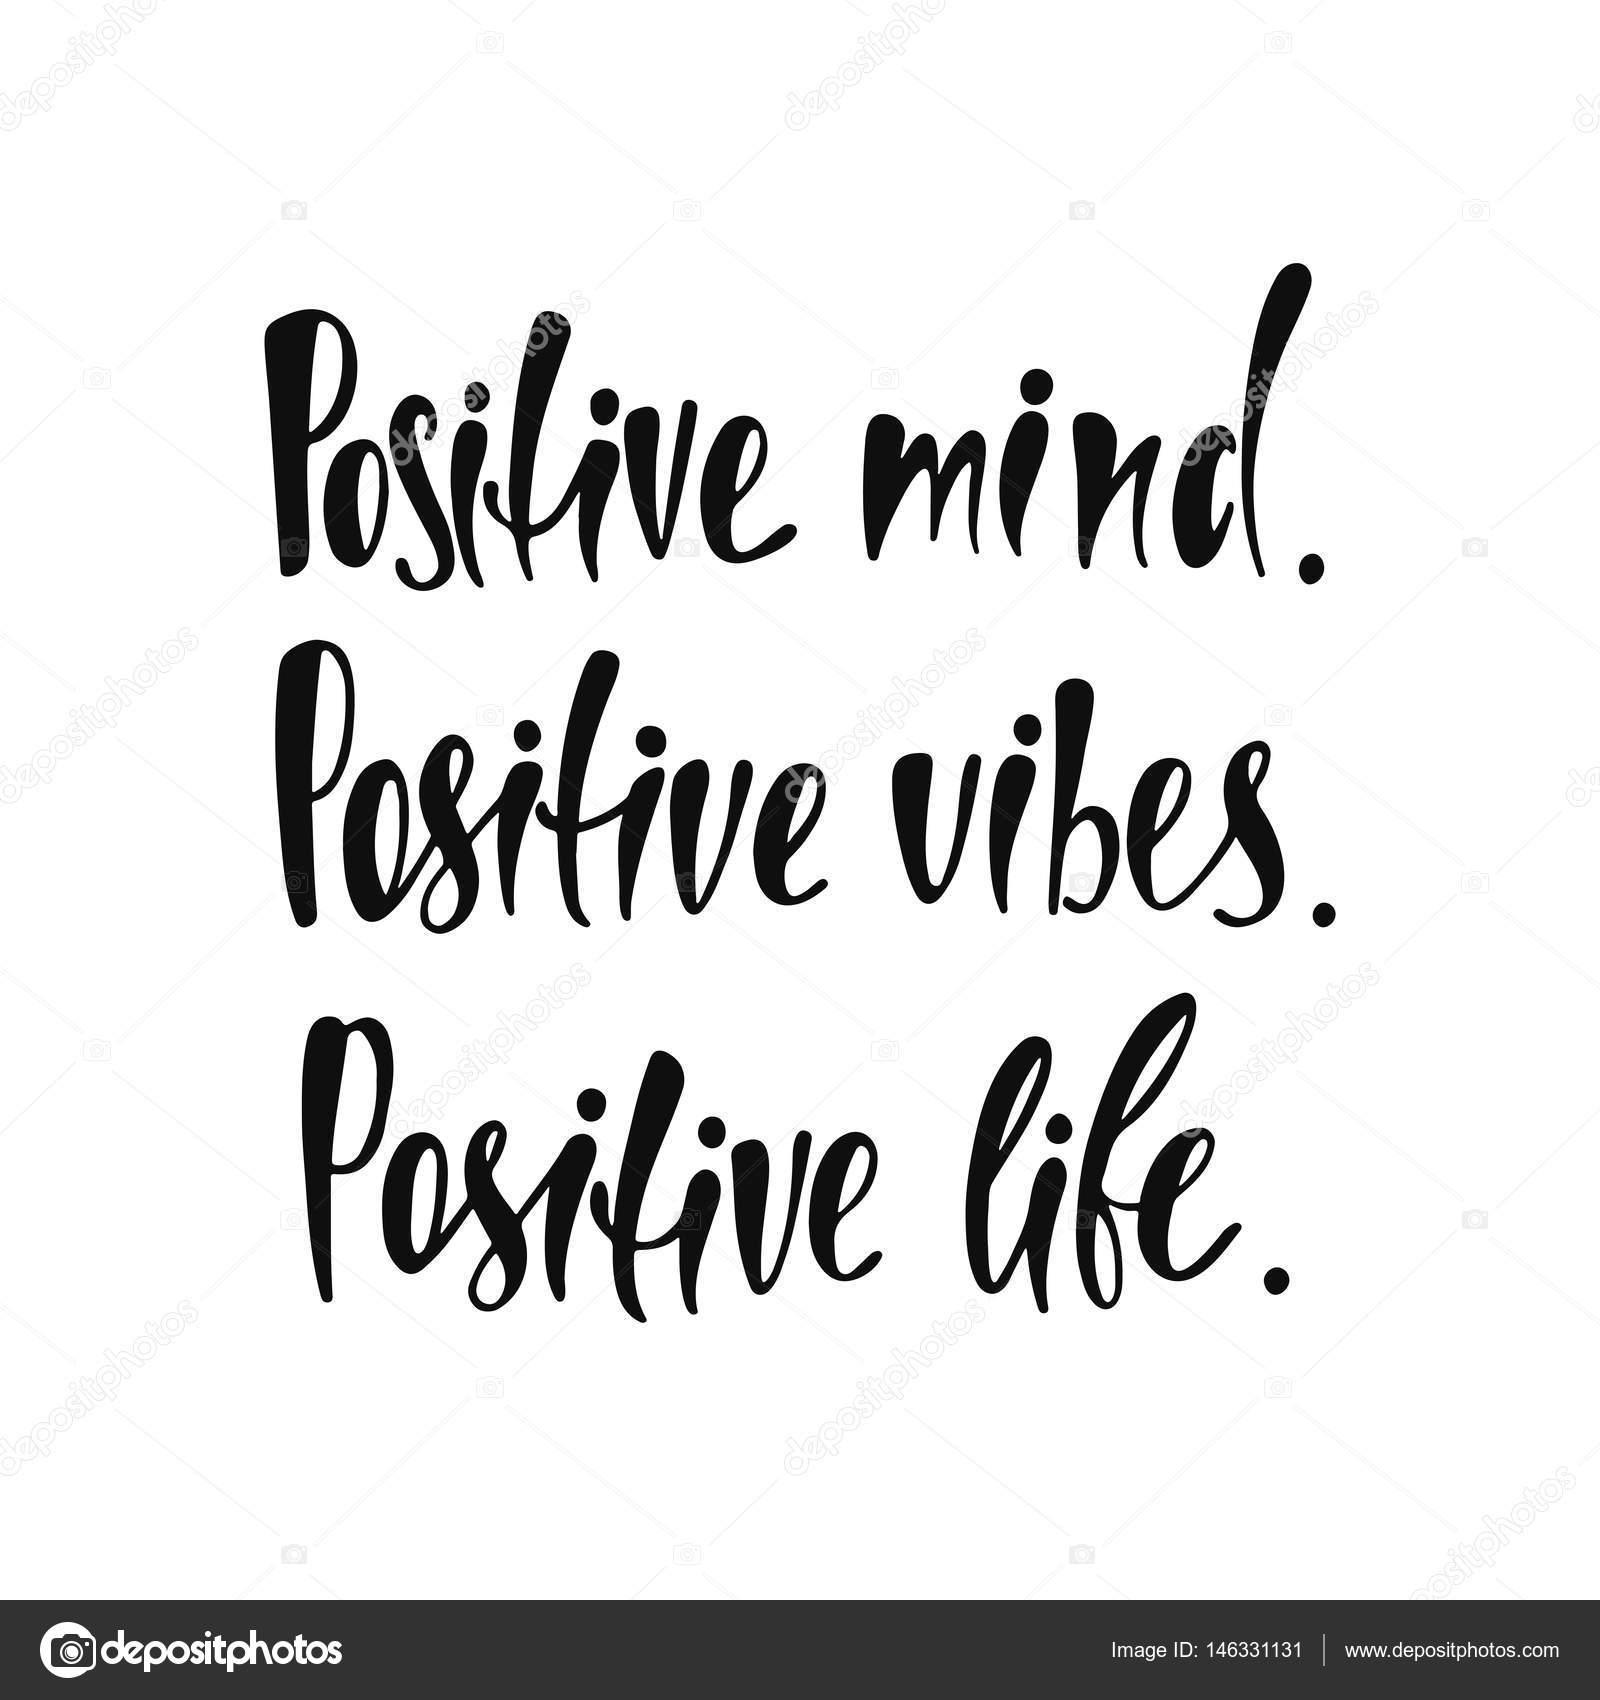 Positive Vibes Quotes Tagalog: Mente Positiva. Vibraciones Positivas. Positivas De Vida